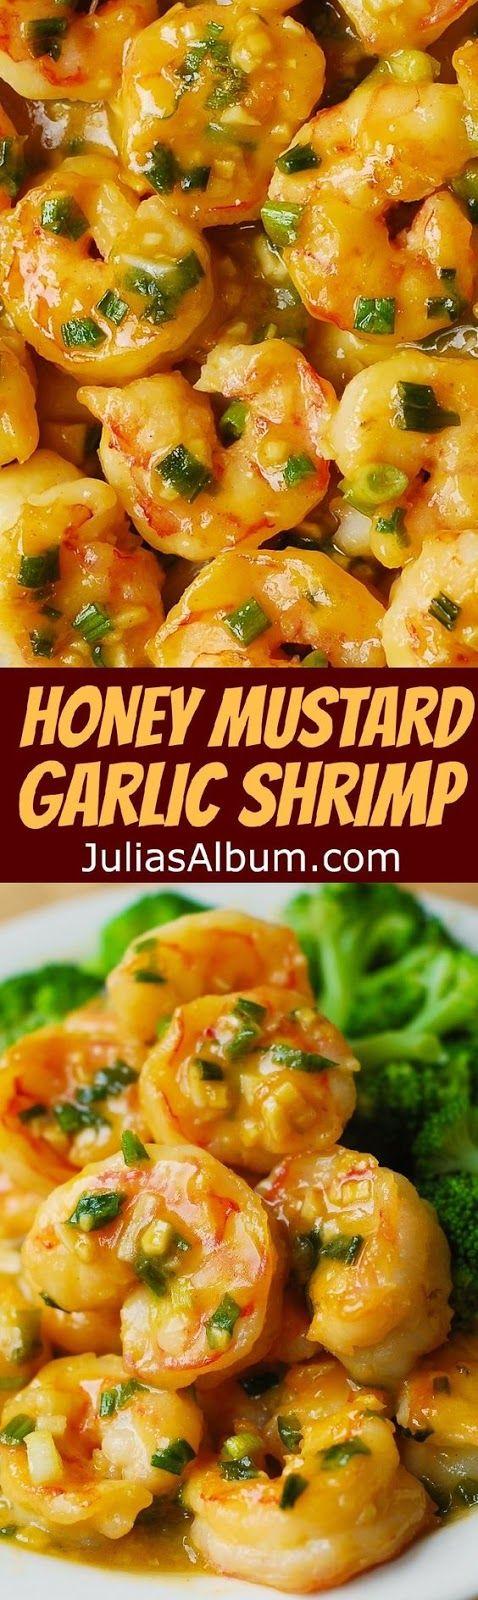 Honey Mustard Garlic Shrimp | Food And Cake Recipes